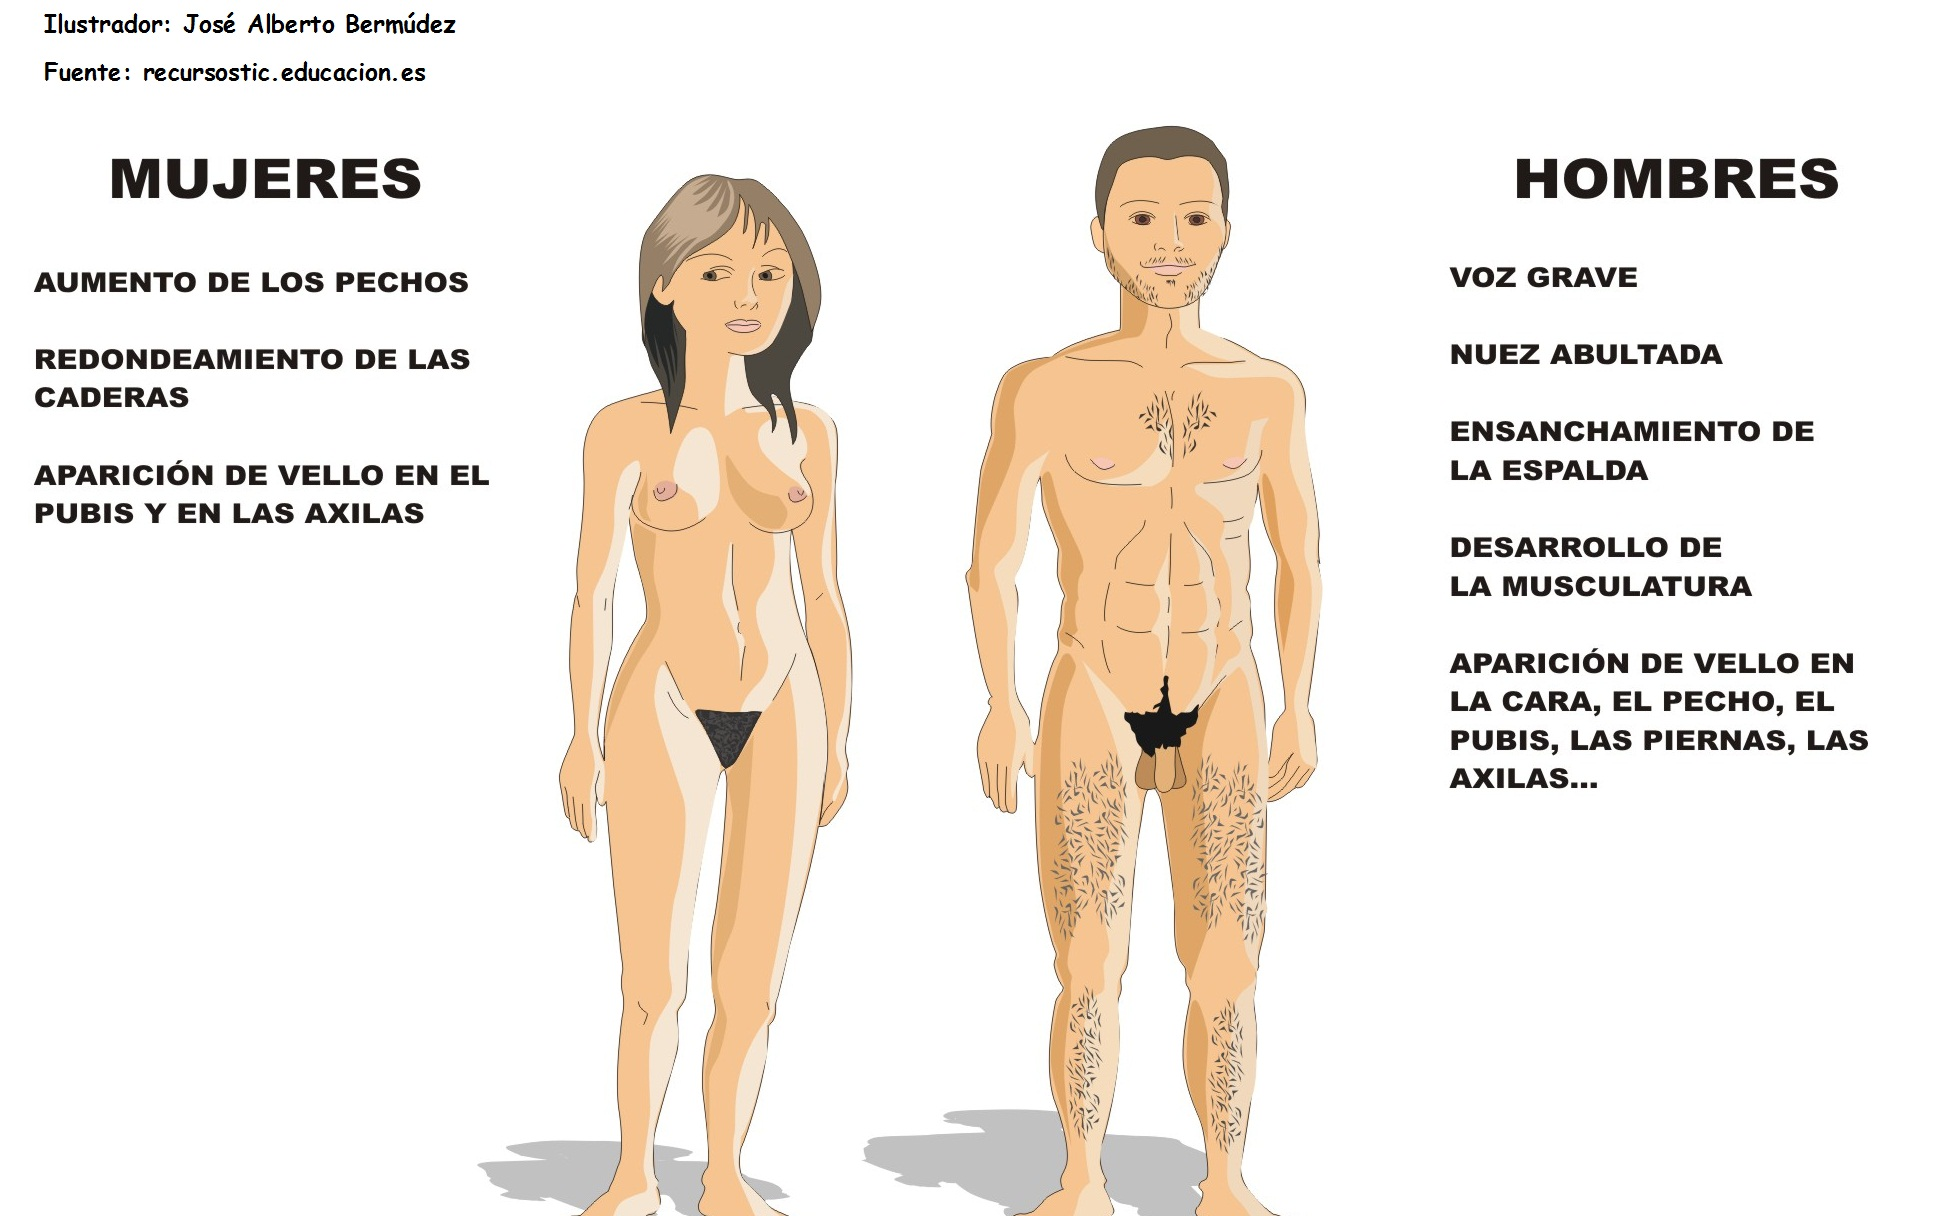 anatomia: Aparato reproductor humano masculino y femenino